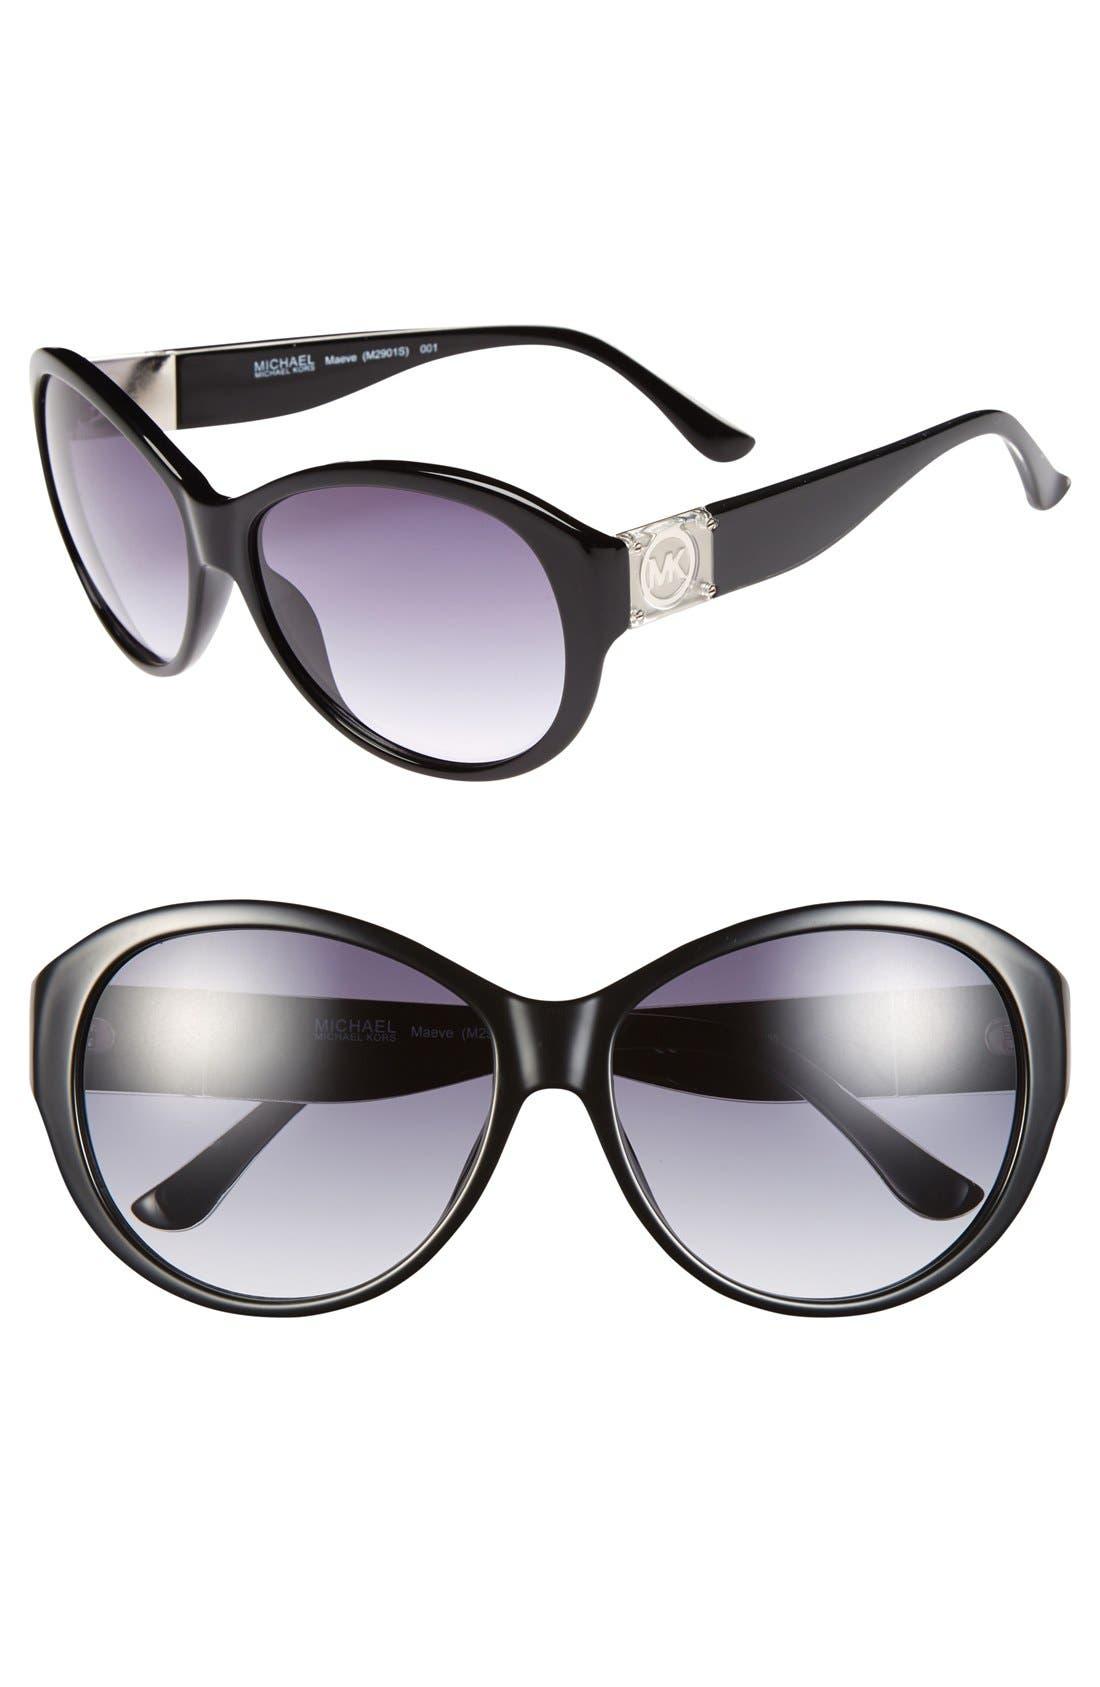 Alternate Image 1 Selected - MICHAEL Michael Kors 'Maeve' 61mm Sunglasses